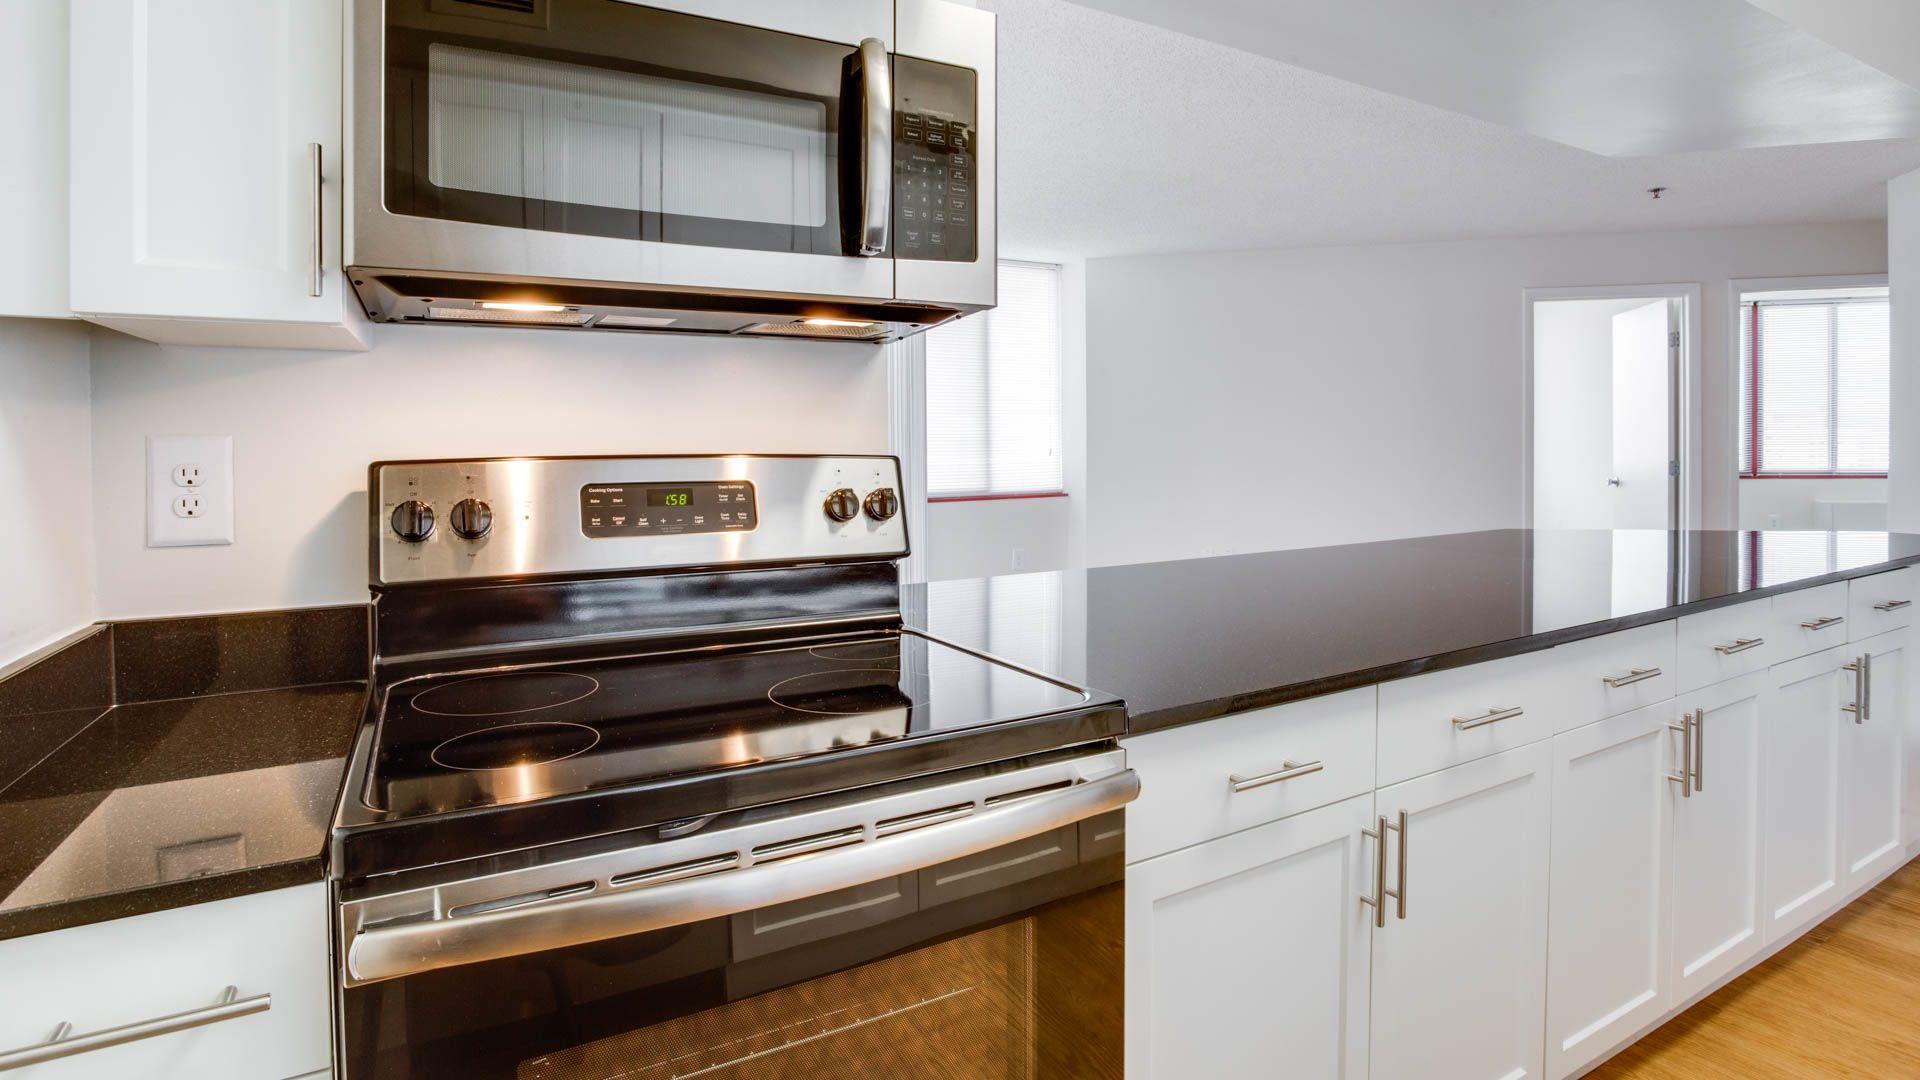 Park at Pentagon Row Apartments - Kitchen